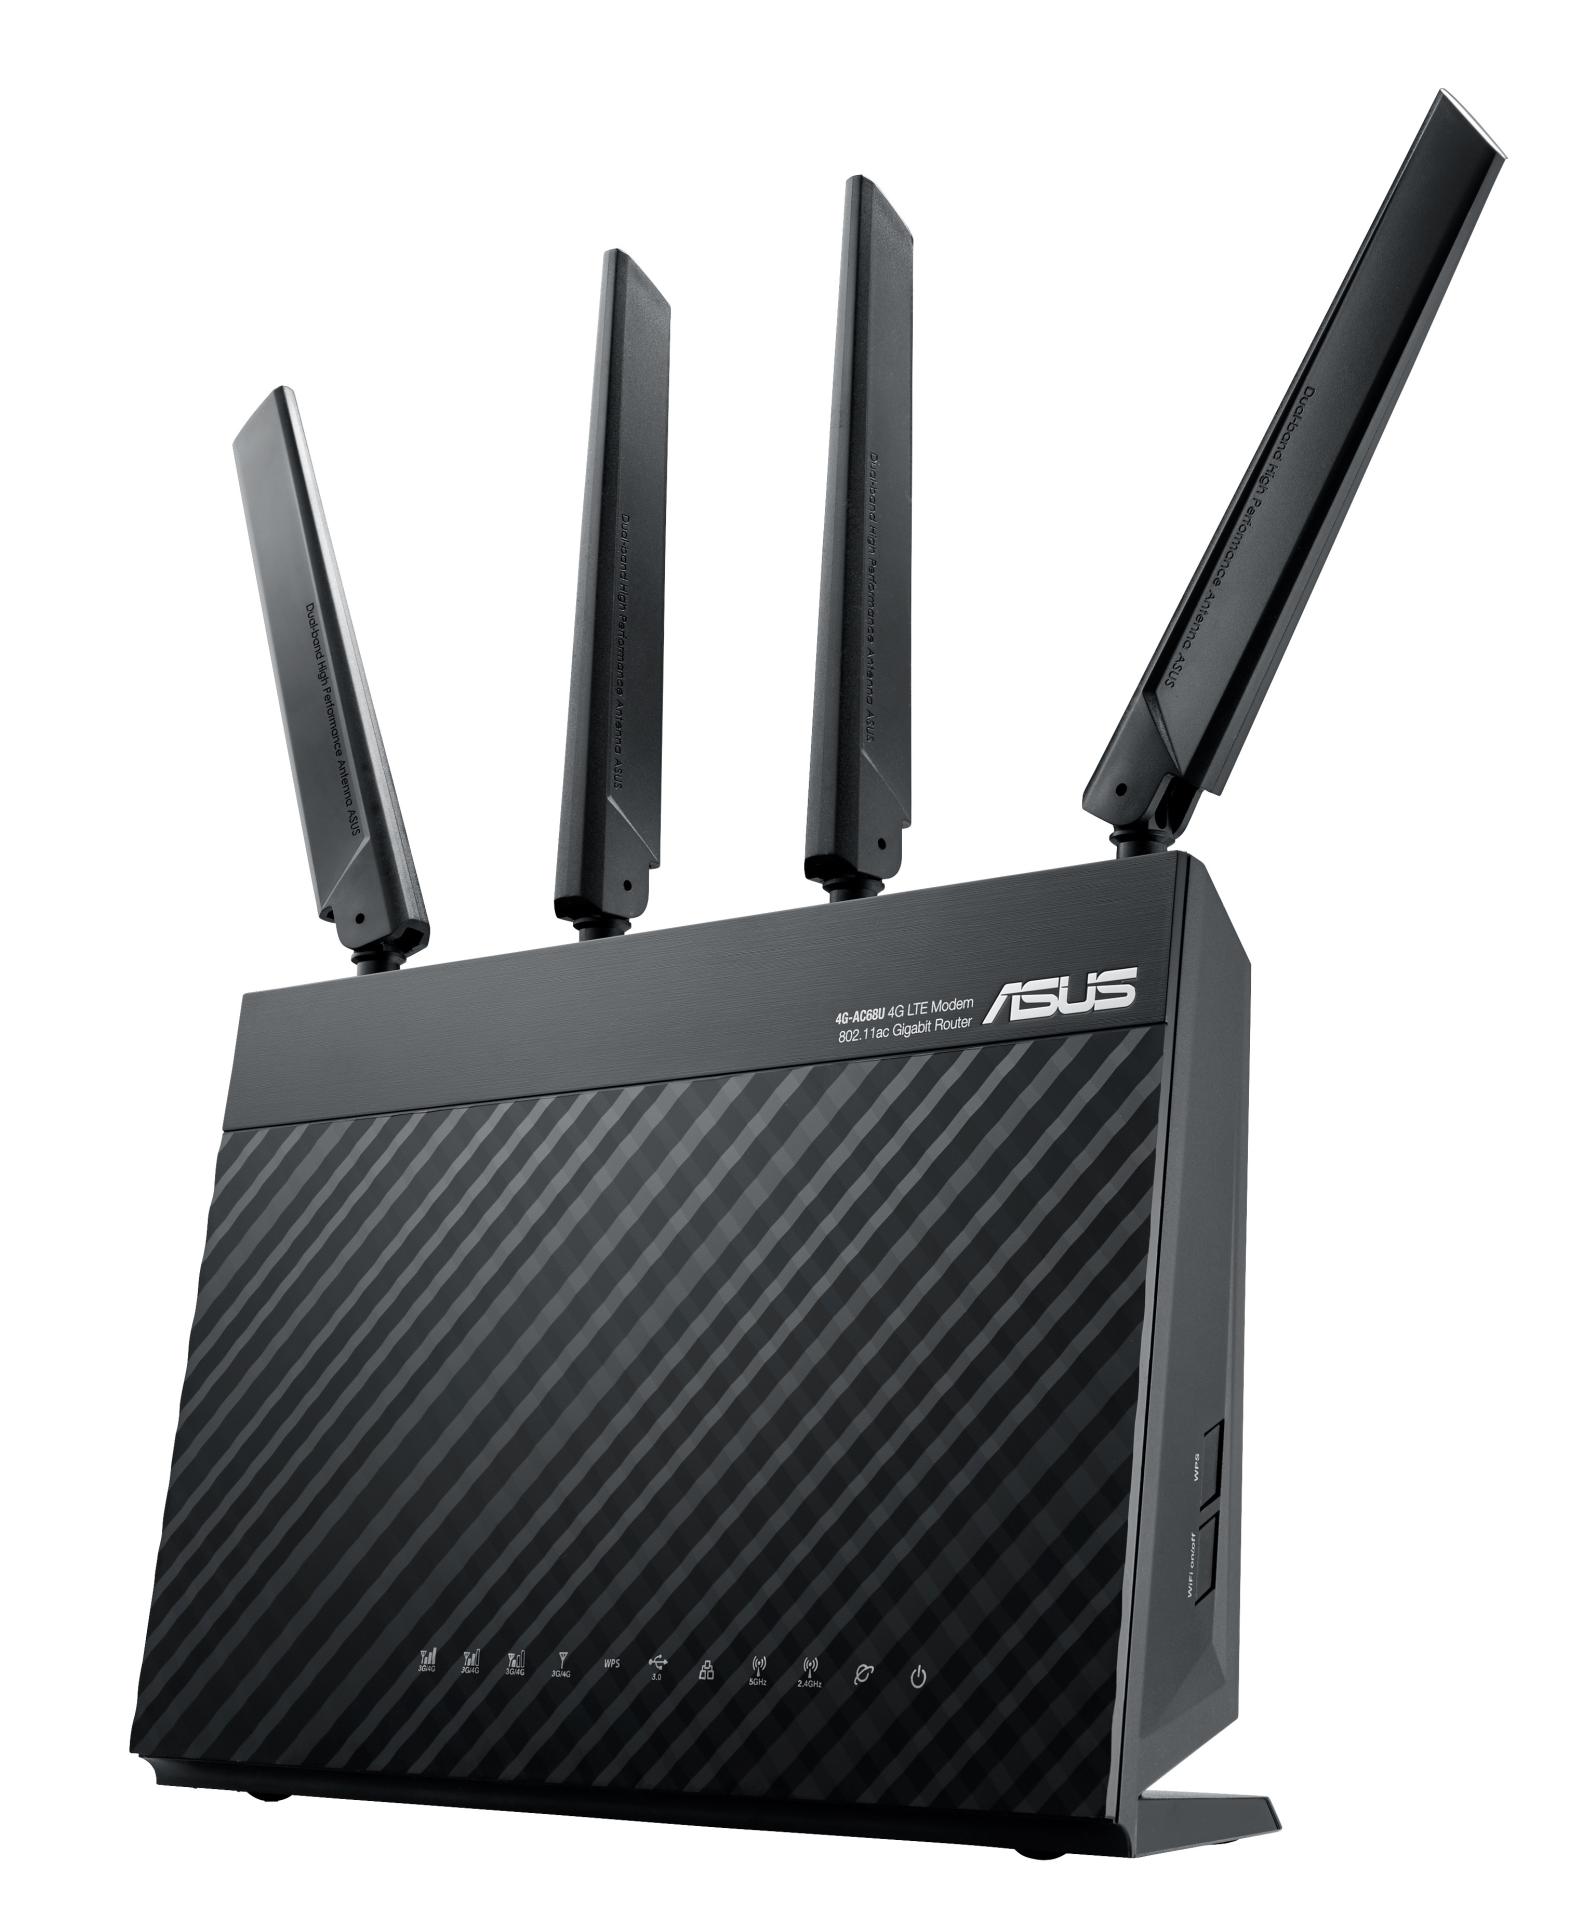 ASUS 4G-AC68U AC1900 Dualband Gigabit LTE WLAN Router WiFi Rūteris